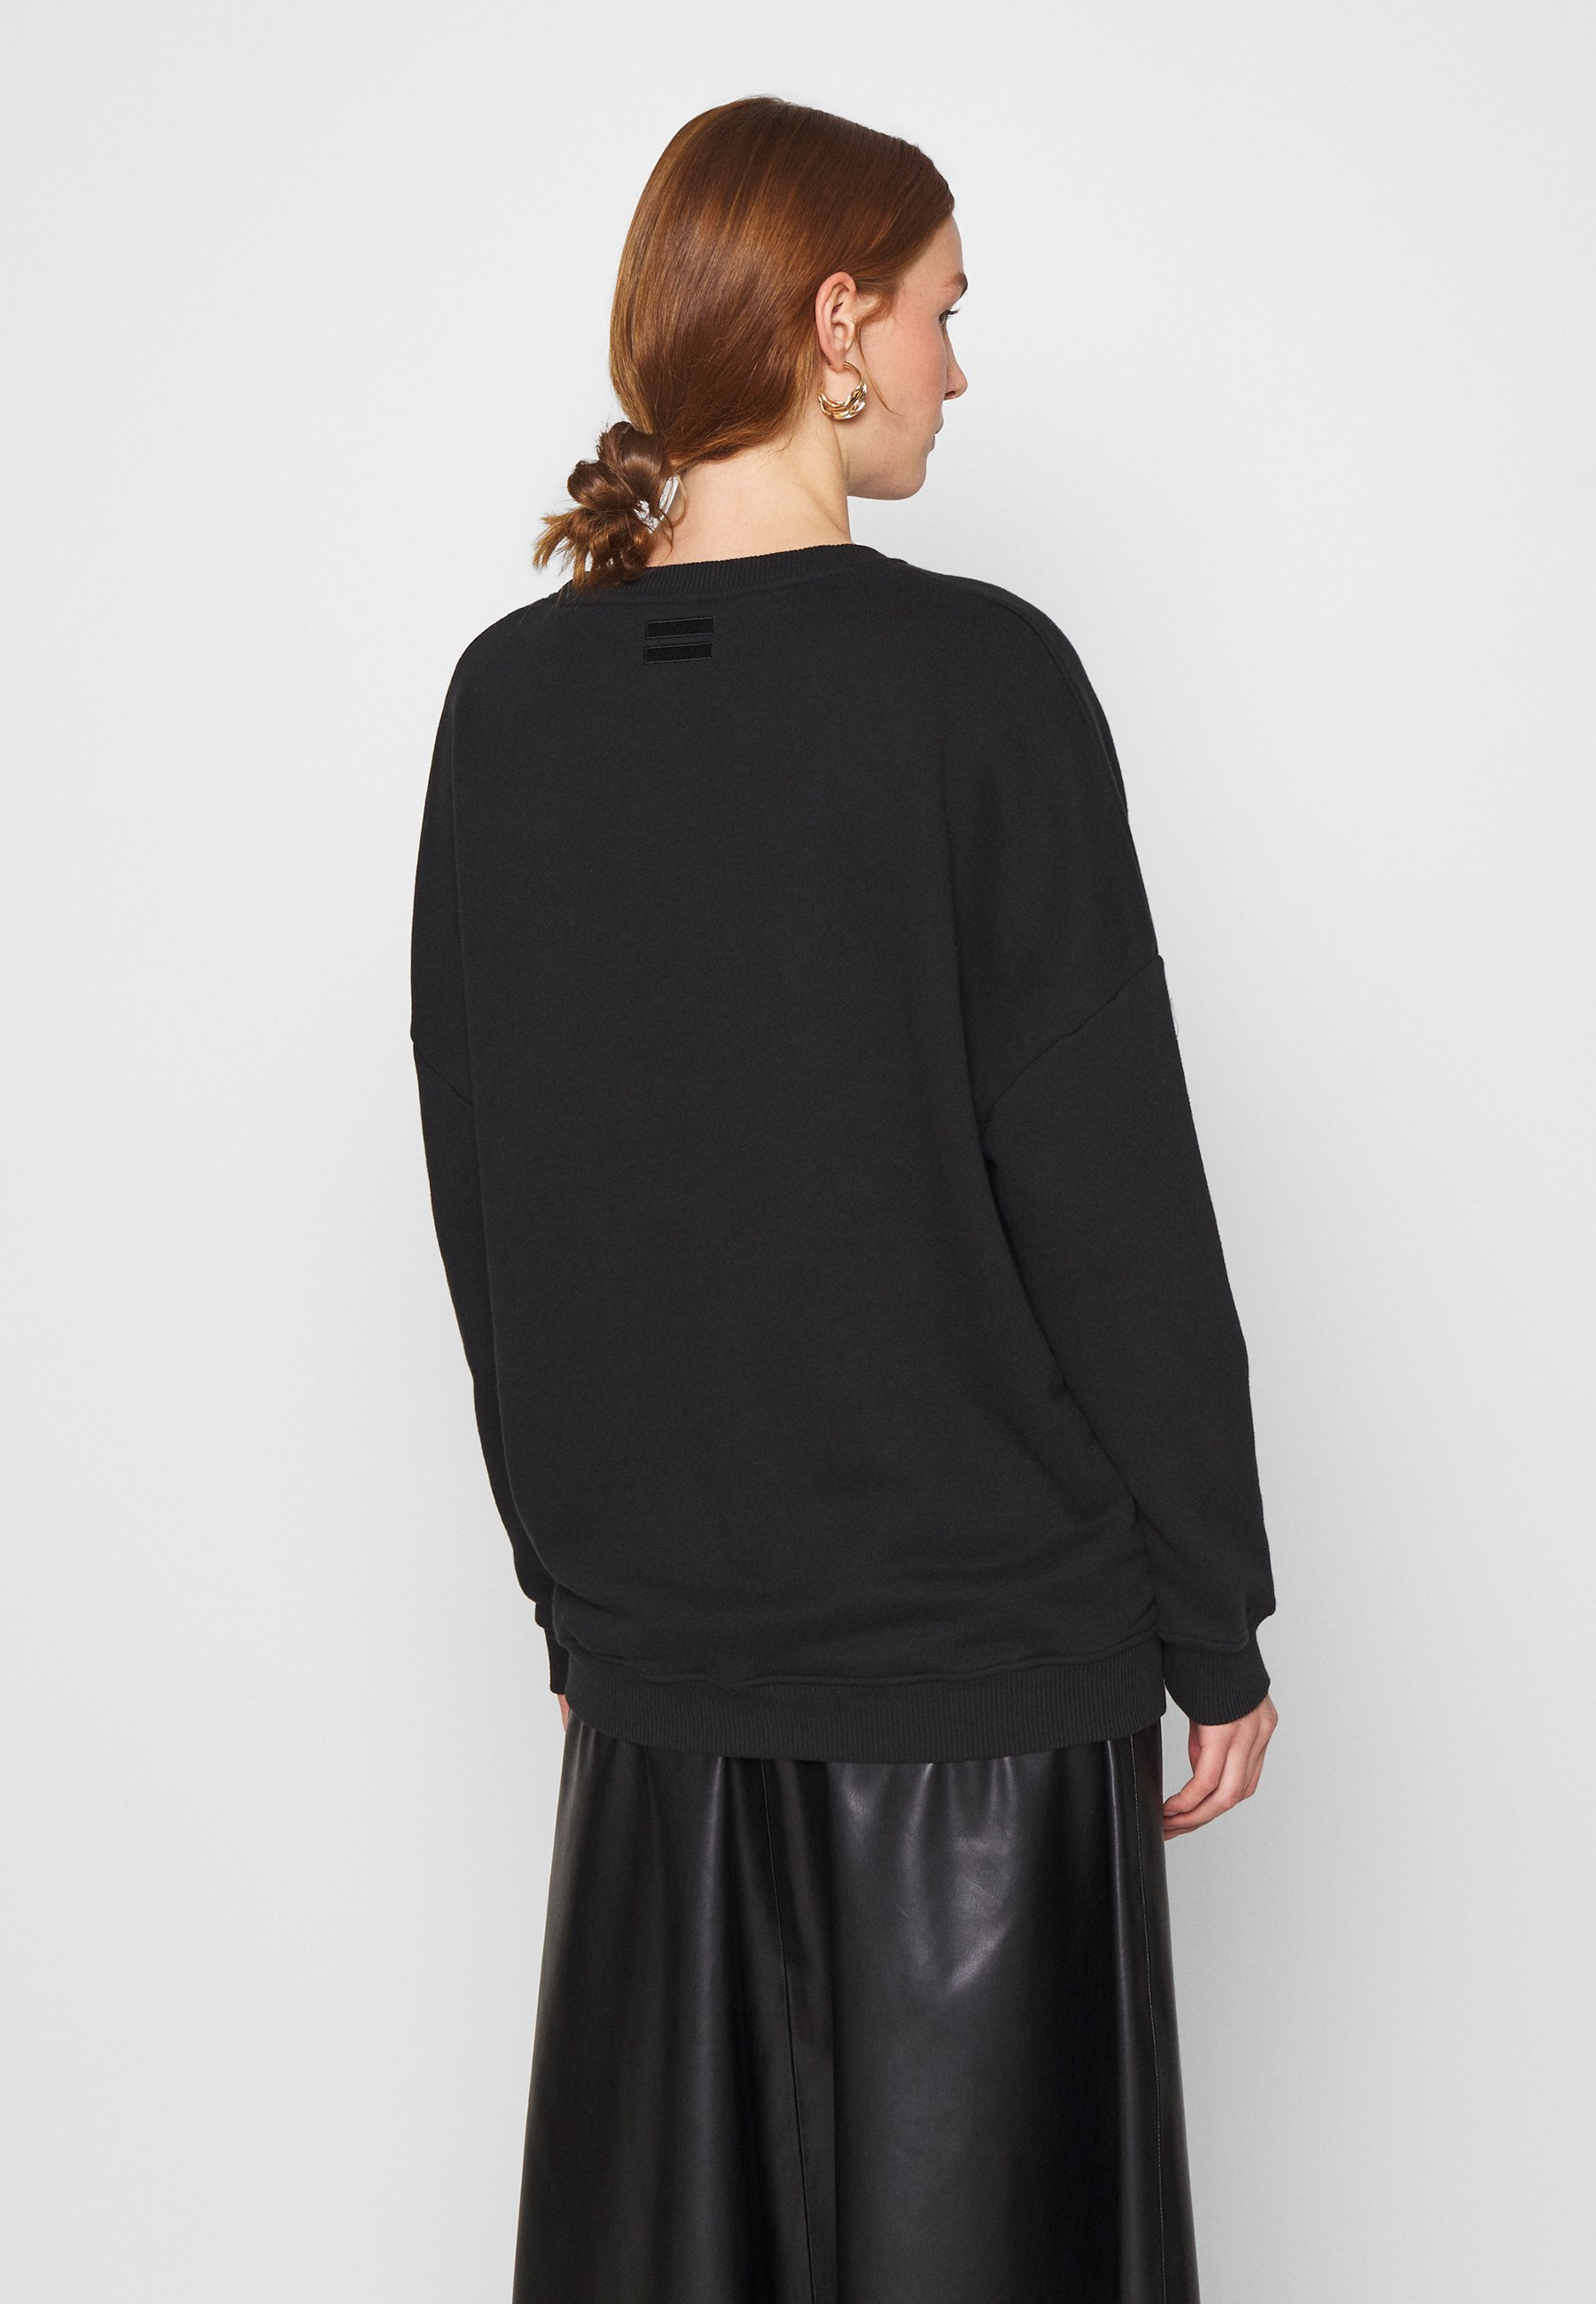 For Sale Women's Clothing 10DAYS PRINT Sweatshirt black 2HfcEWre1